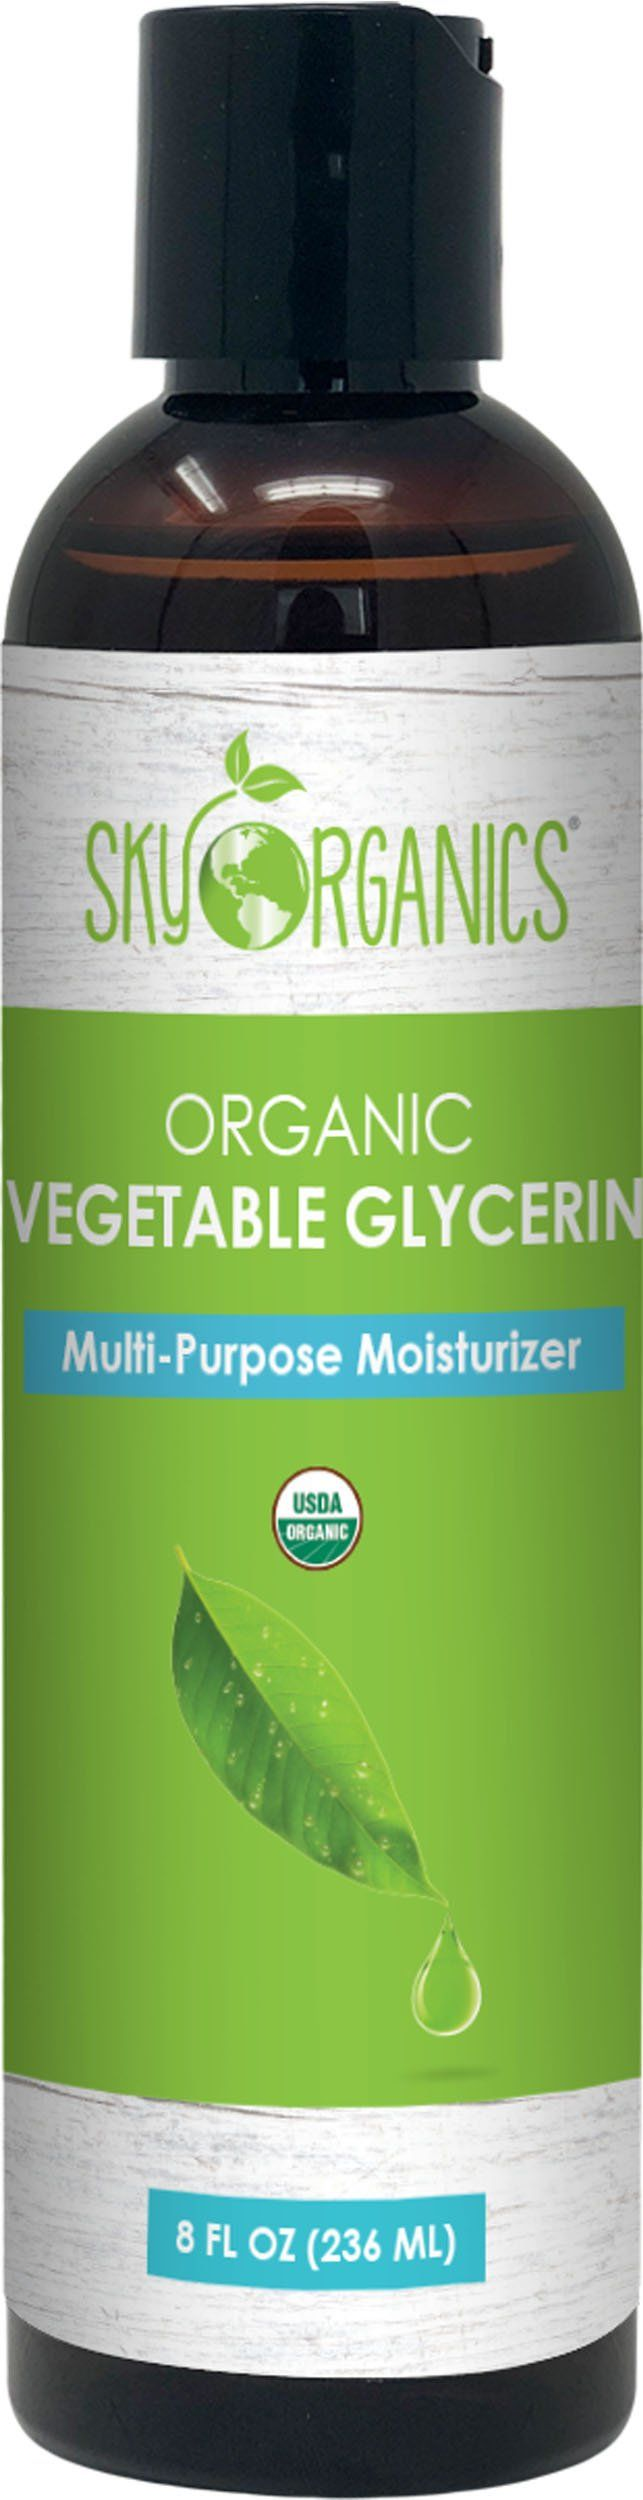 Sky Organics Organic Vegetable Glycerin